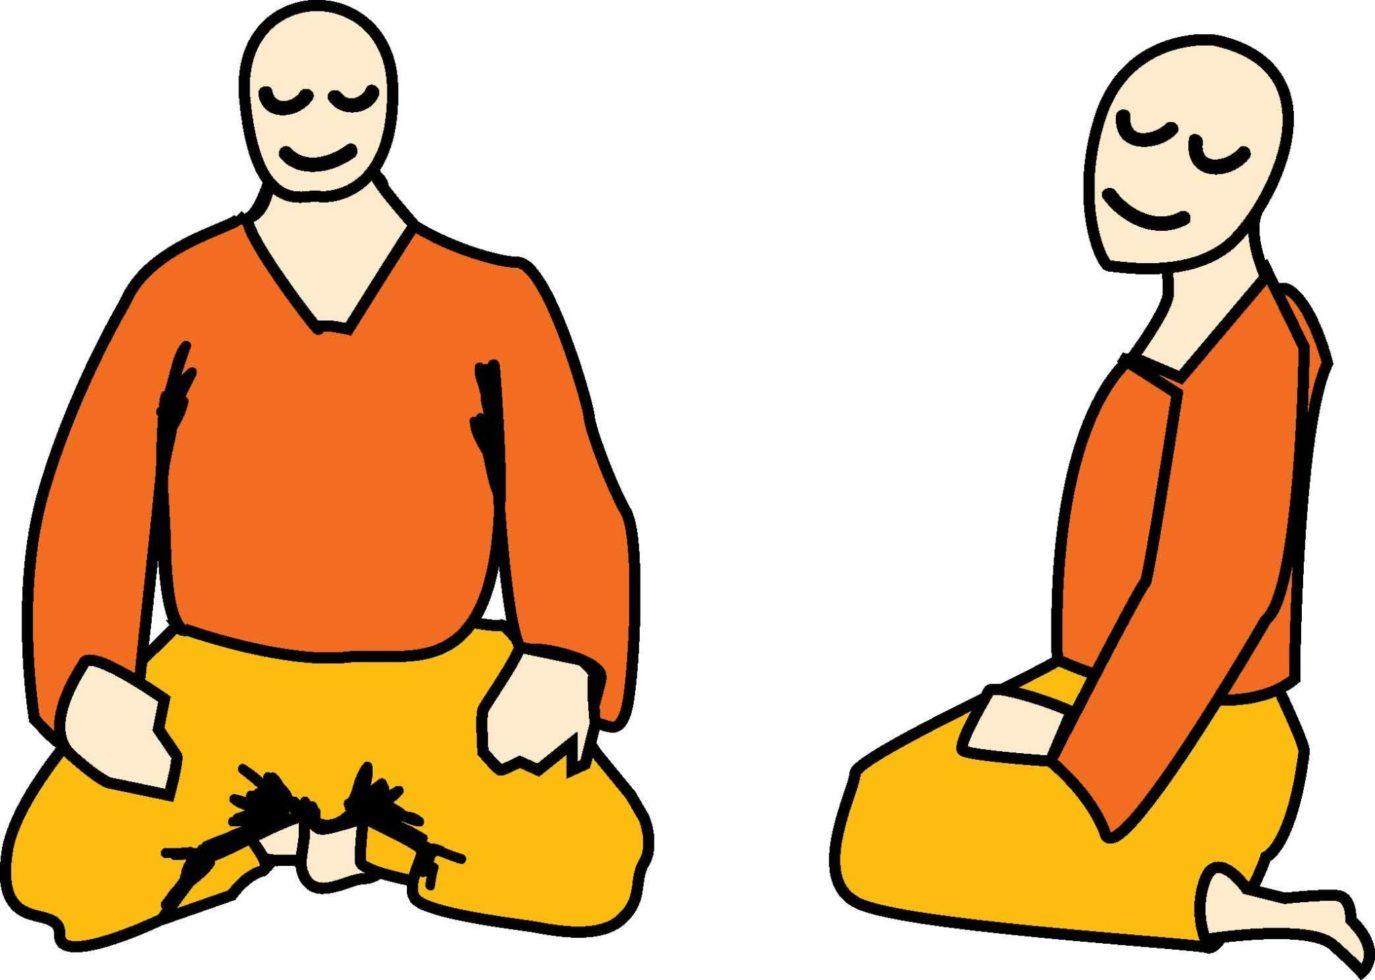 zazen meditation posture: Seiza